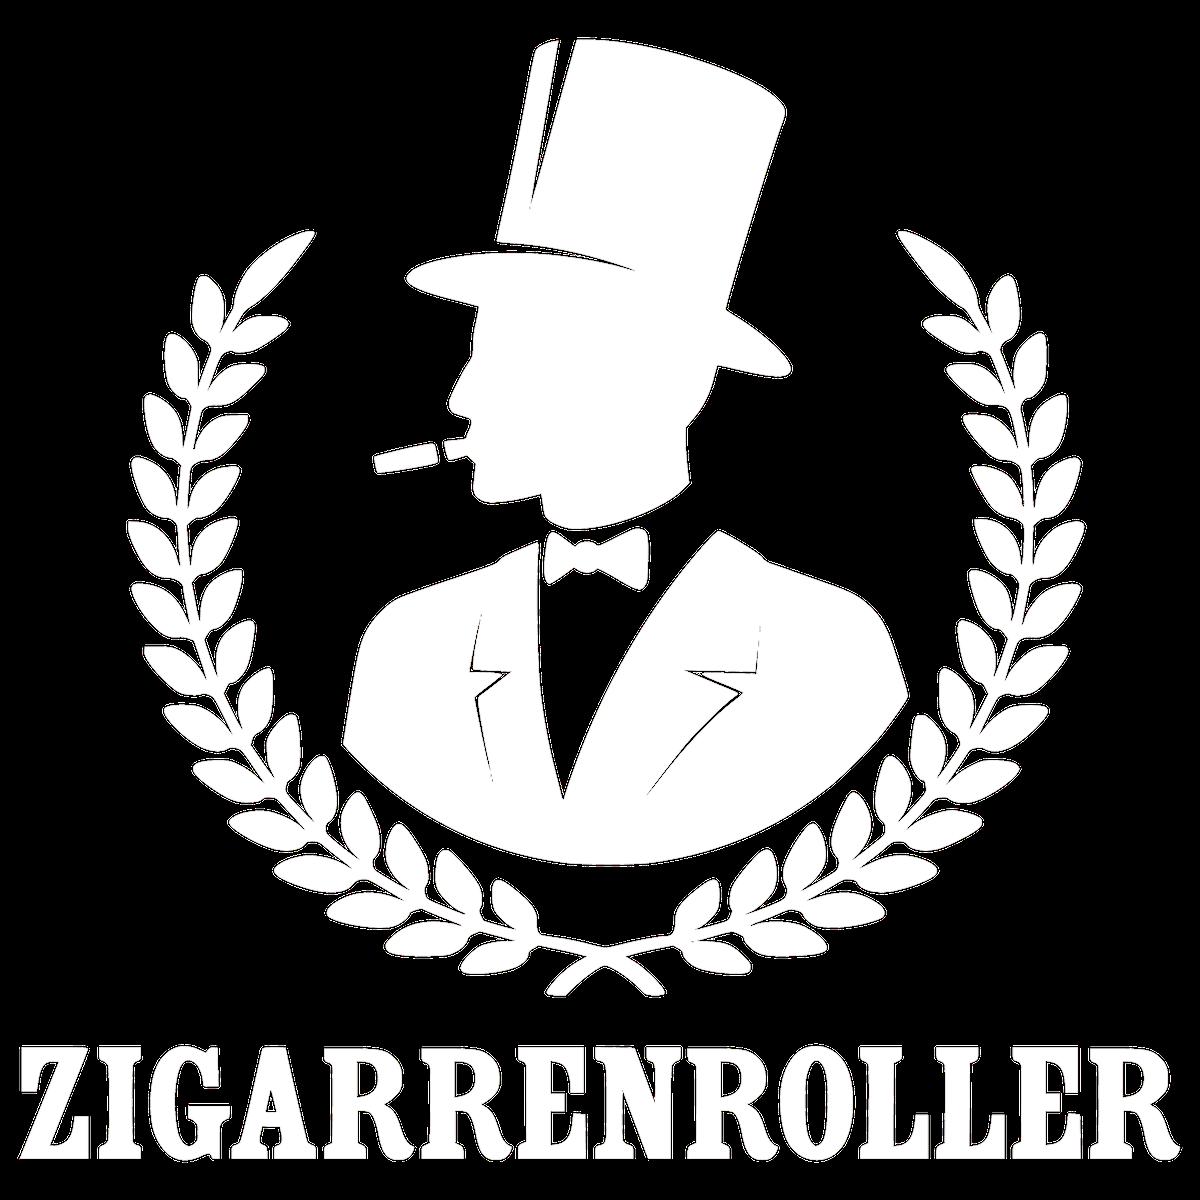 Zigarrenroller   Zigarrendreher   Lounge   Manufaktur   Kuba   Zigarren   Tabak